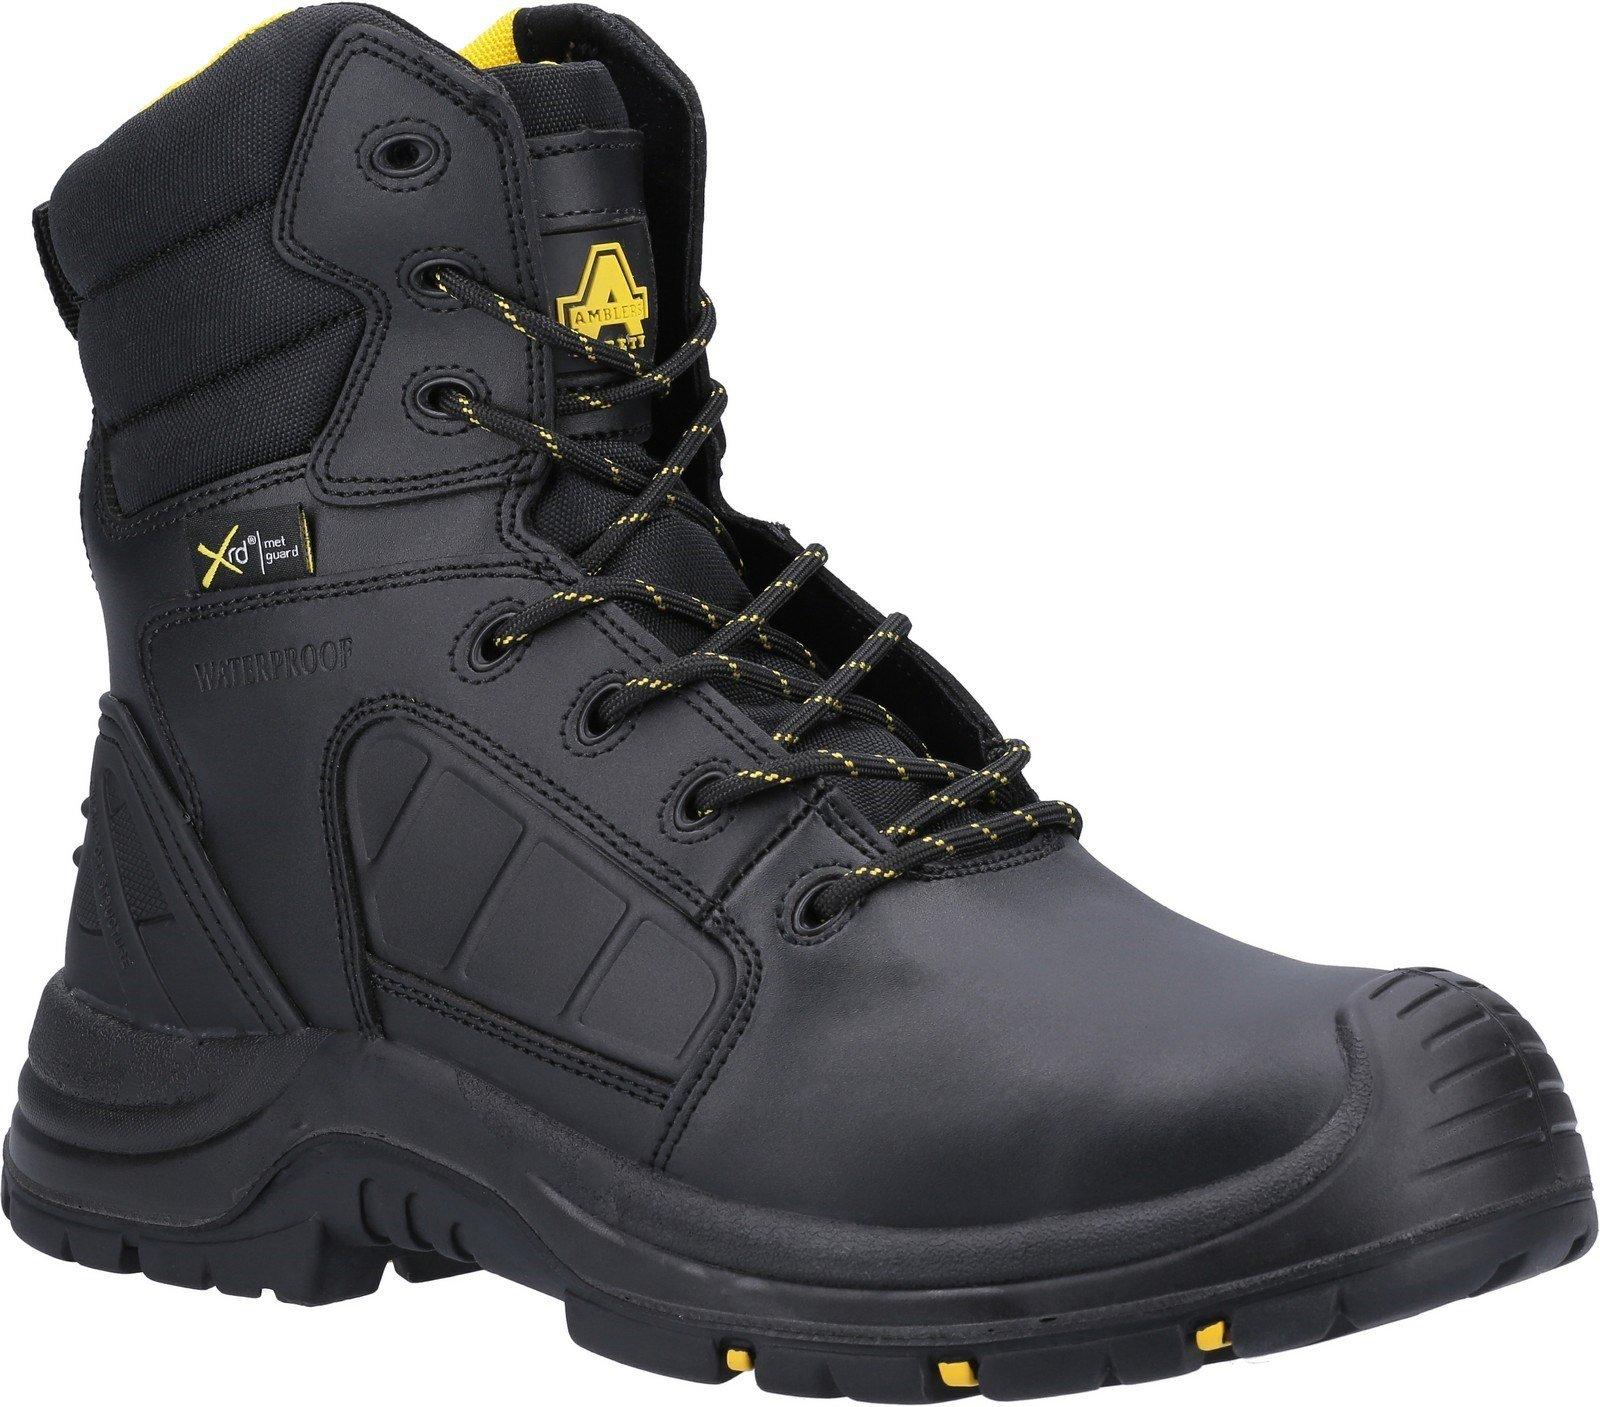 Amblers Unisex Safety Berwyn Hi-Leg Waterproof Safety Boot Black 29735 - Black 10